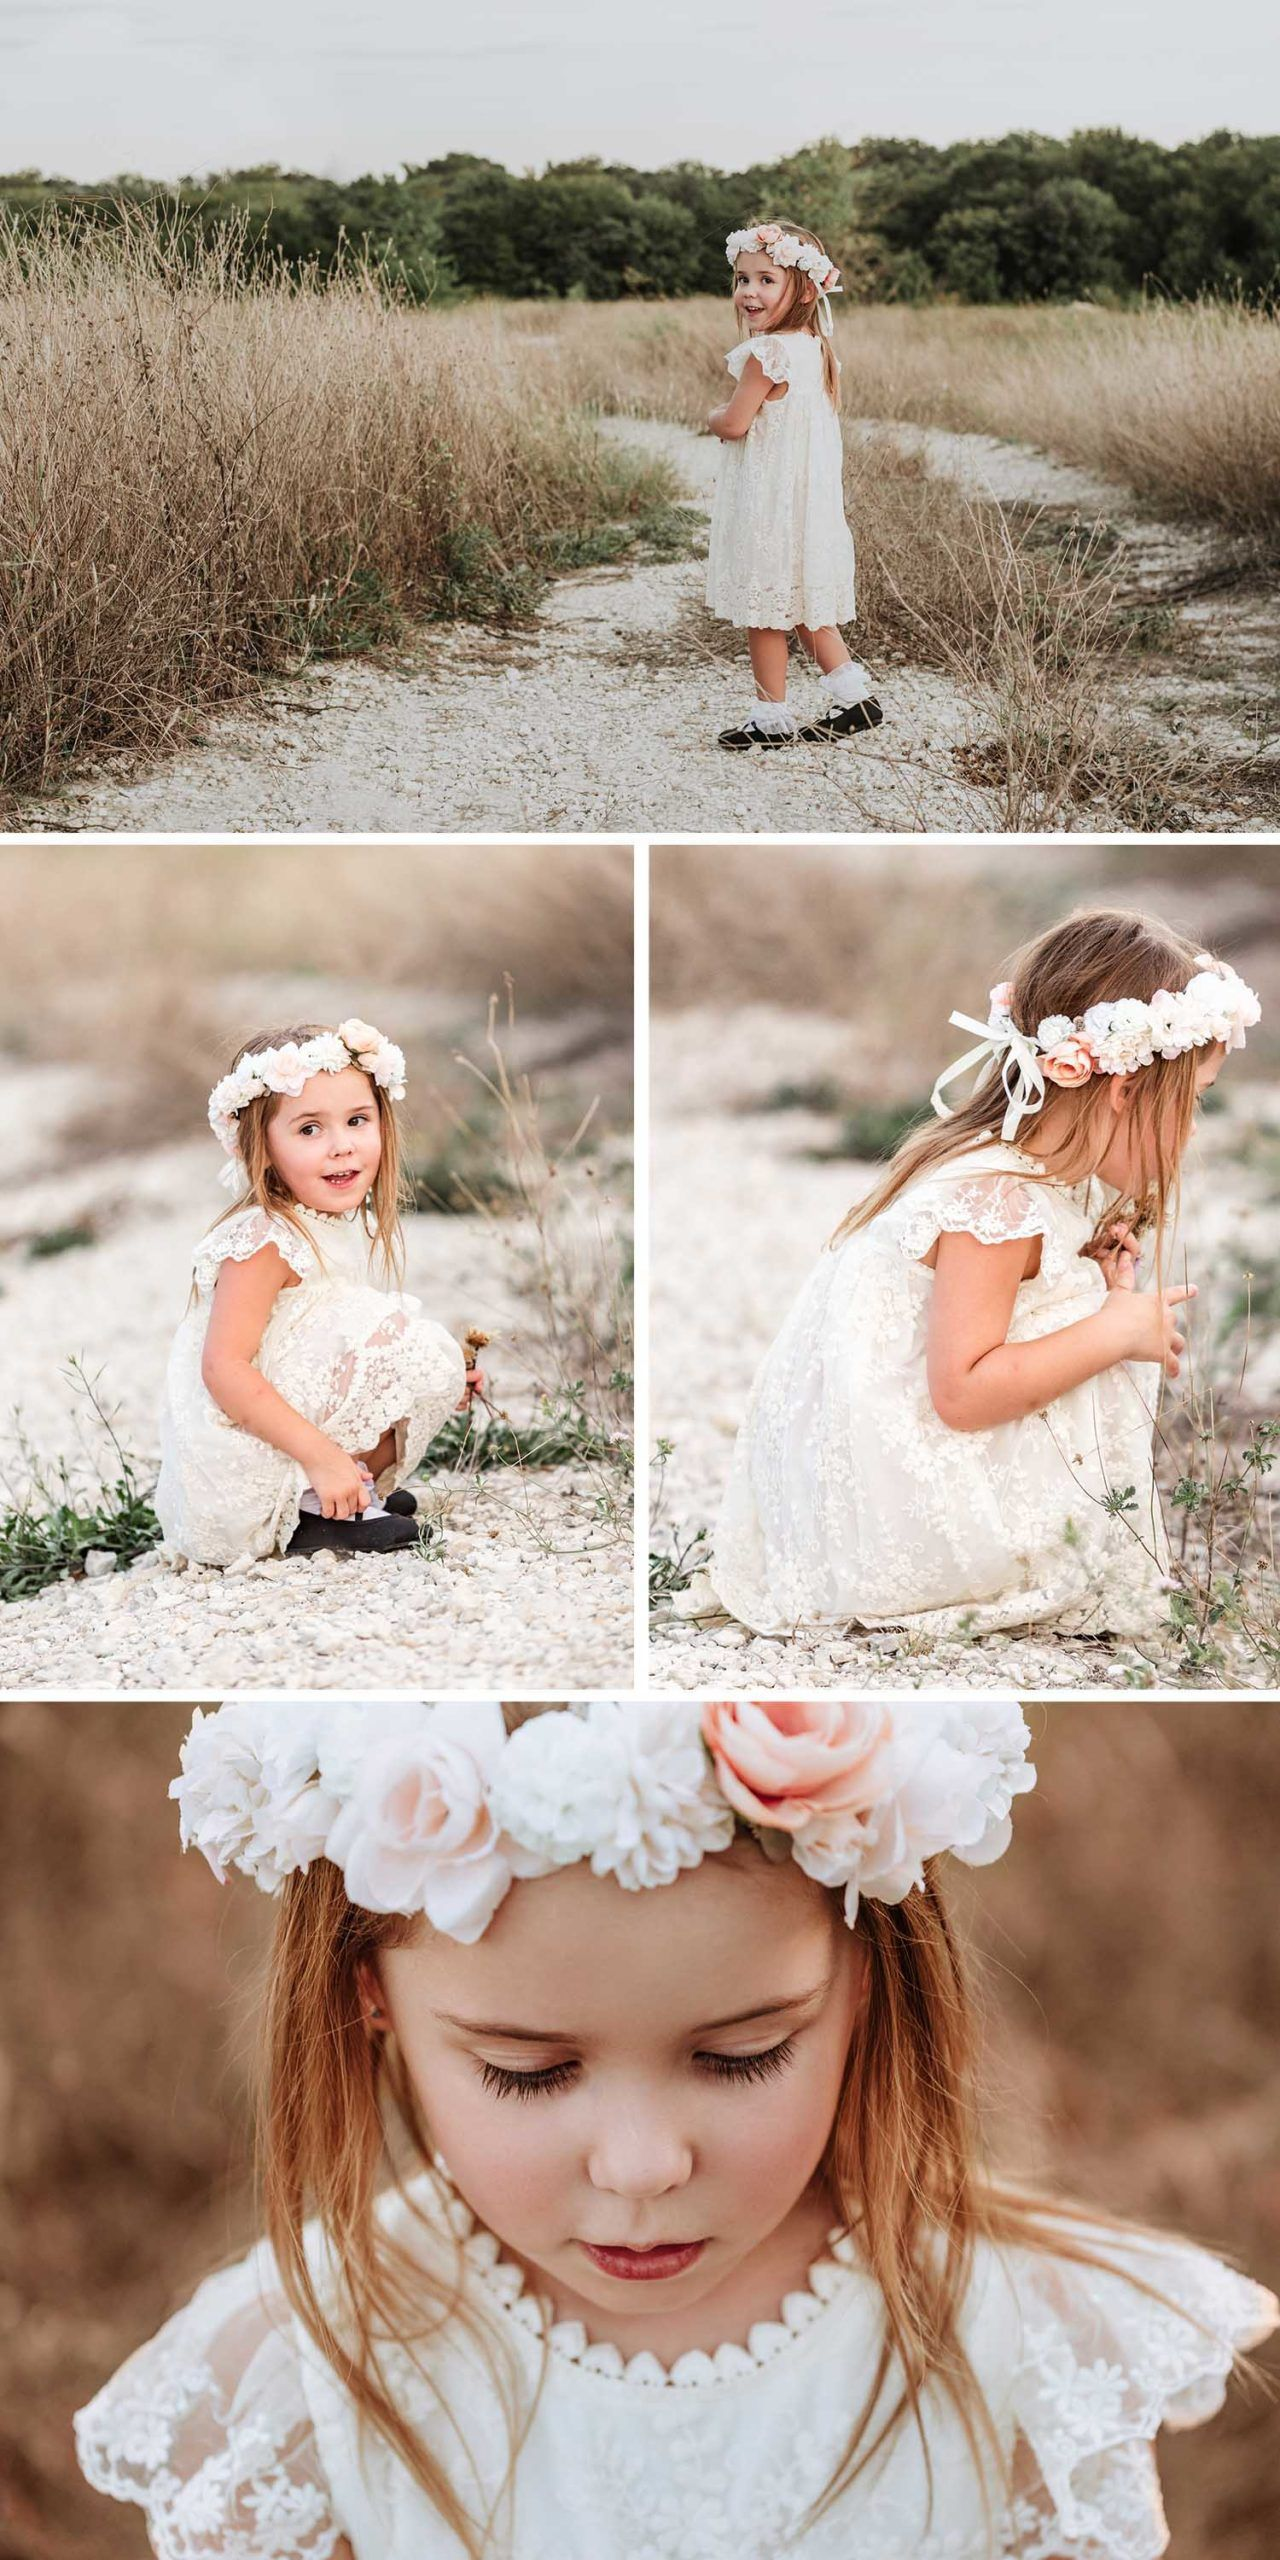 Third Birthday Photo Session Christina Freeman Photography Christinafreemanphotos Three Year Baby Photoshoot Girl Toddler Girl Pictures Kids Photoshoot